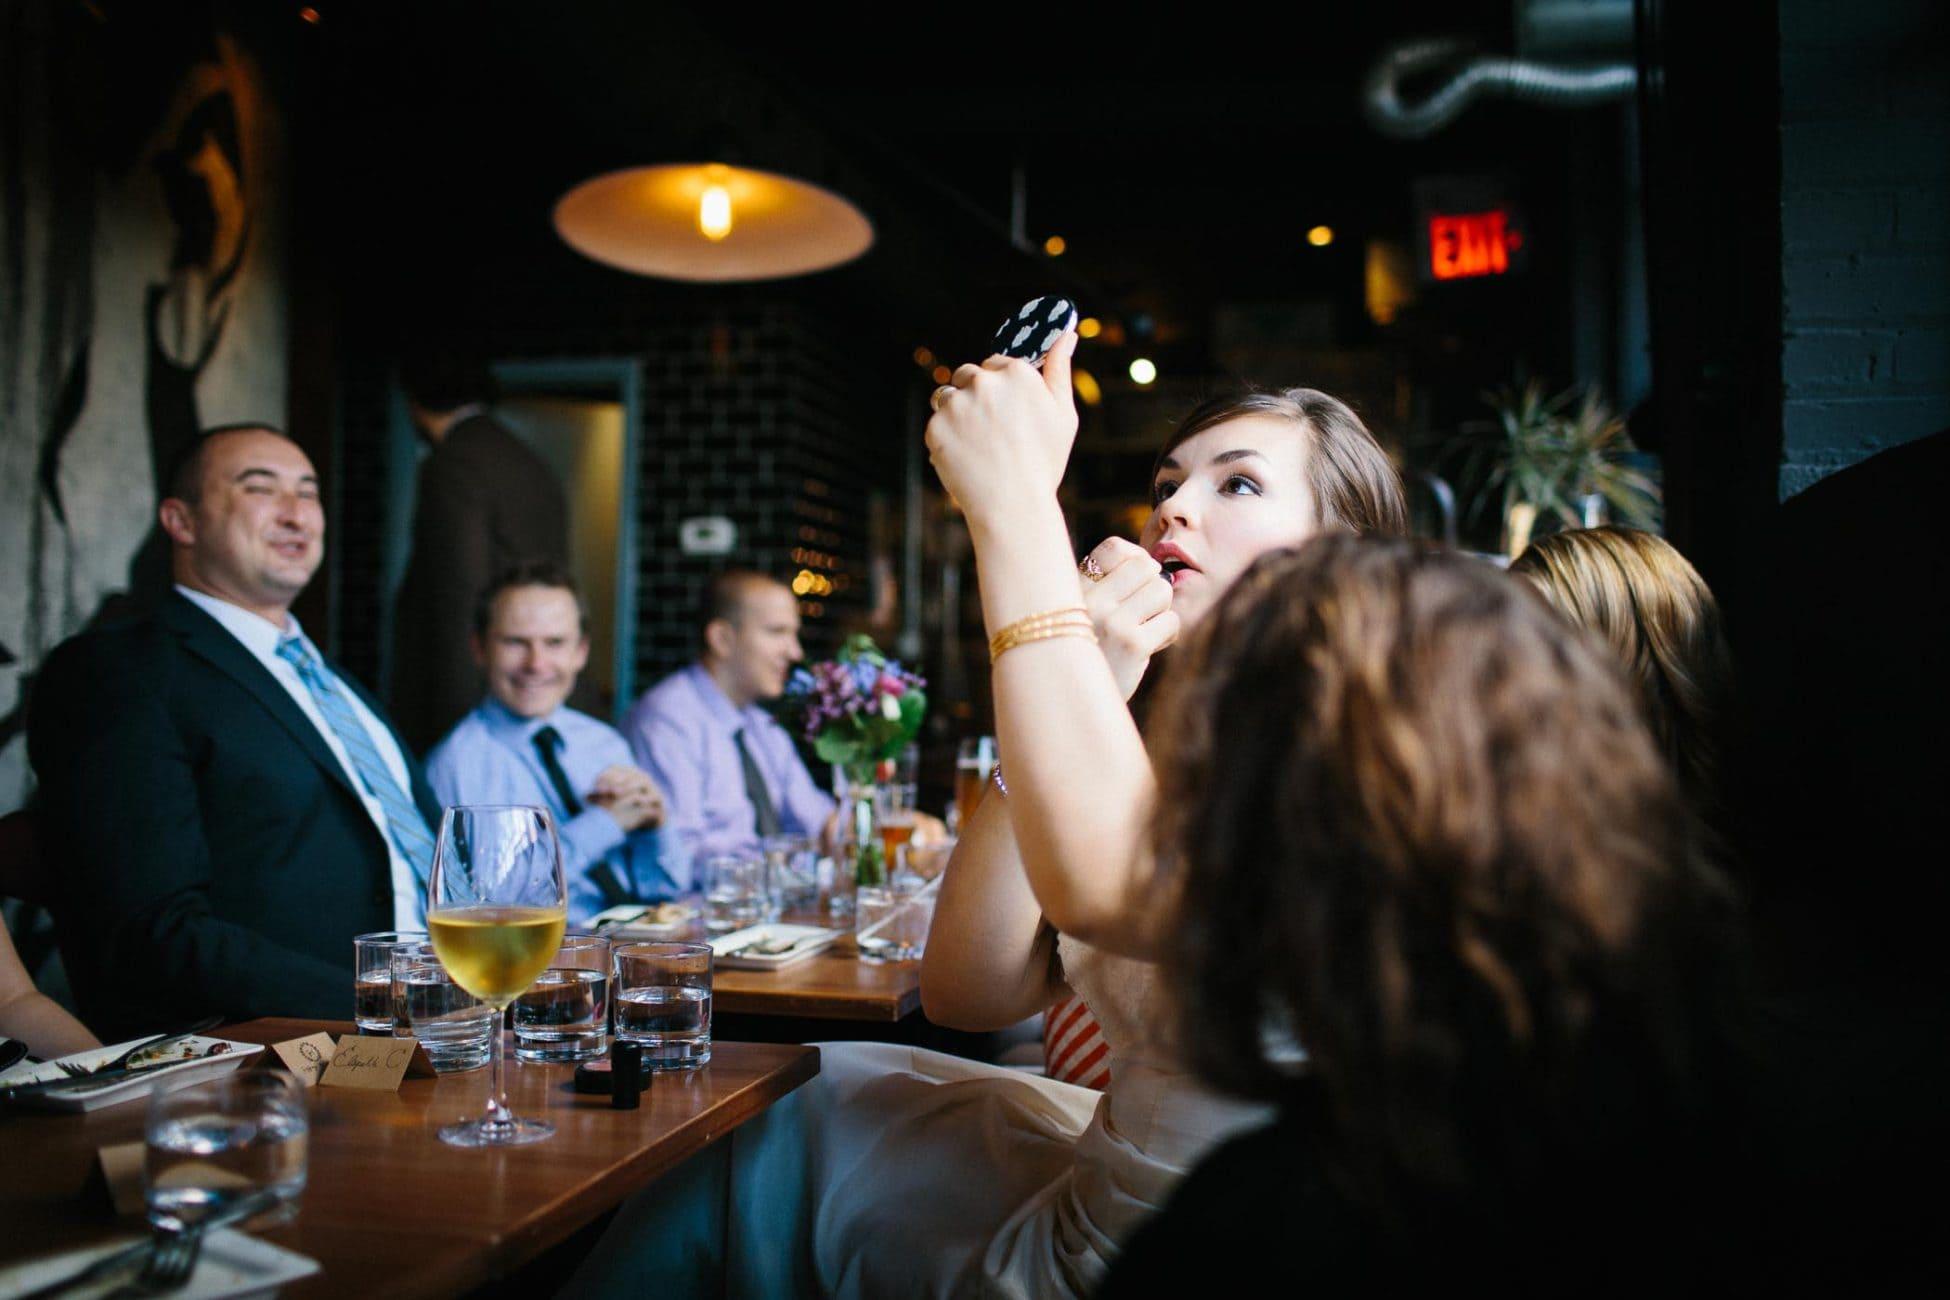 The bride applying her lipstick in small vanity mirror in restaurant wedding reception. Documentary wedding photography by Pavel Kounine.